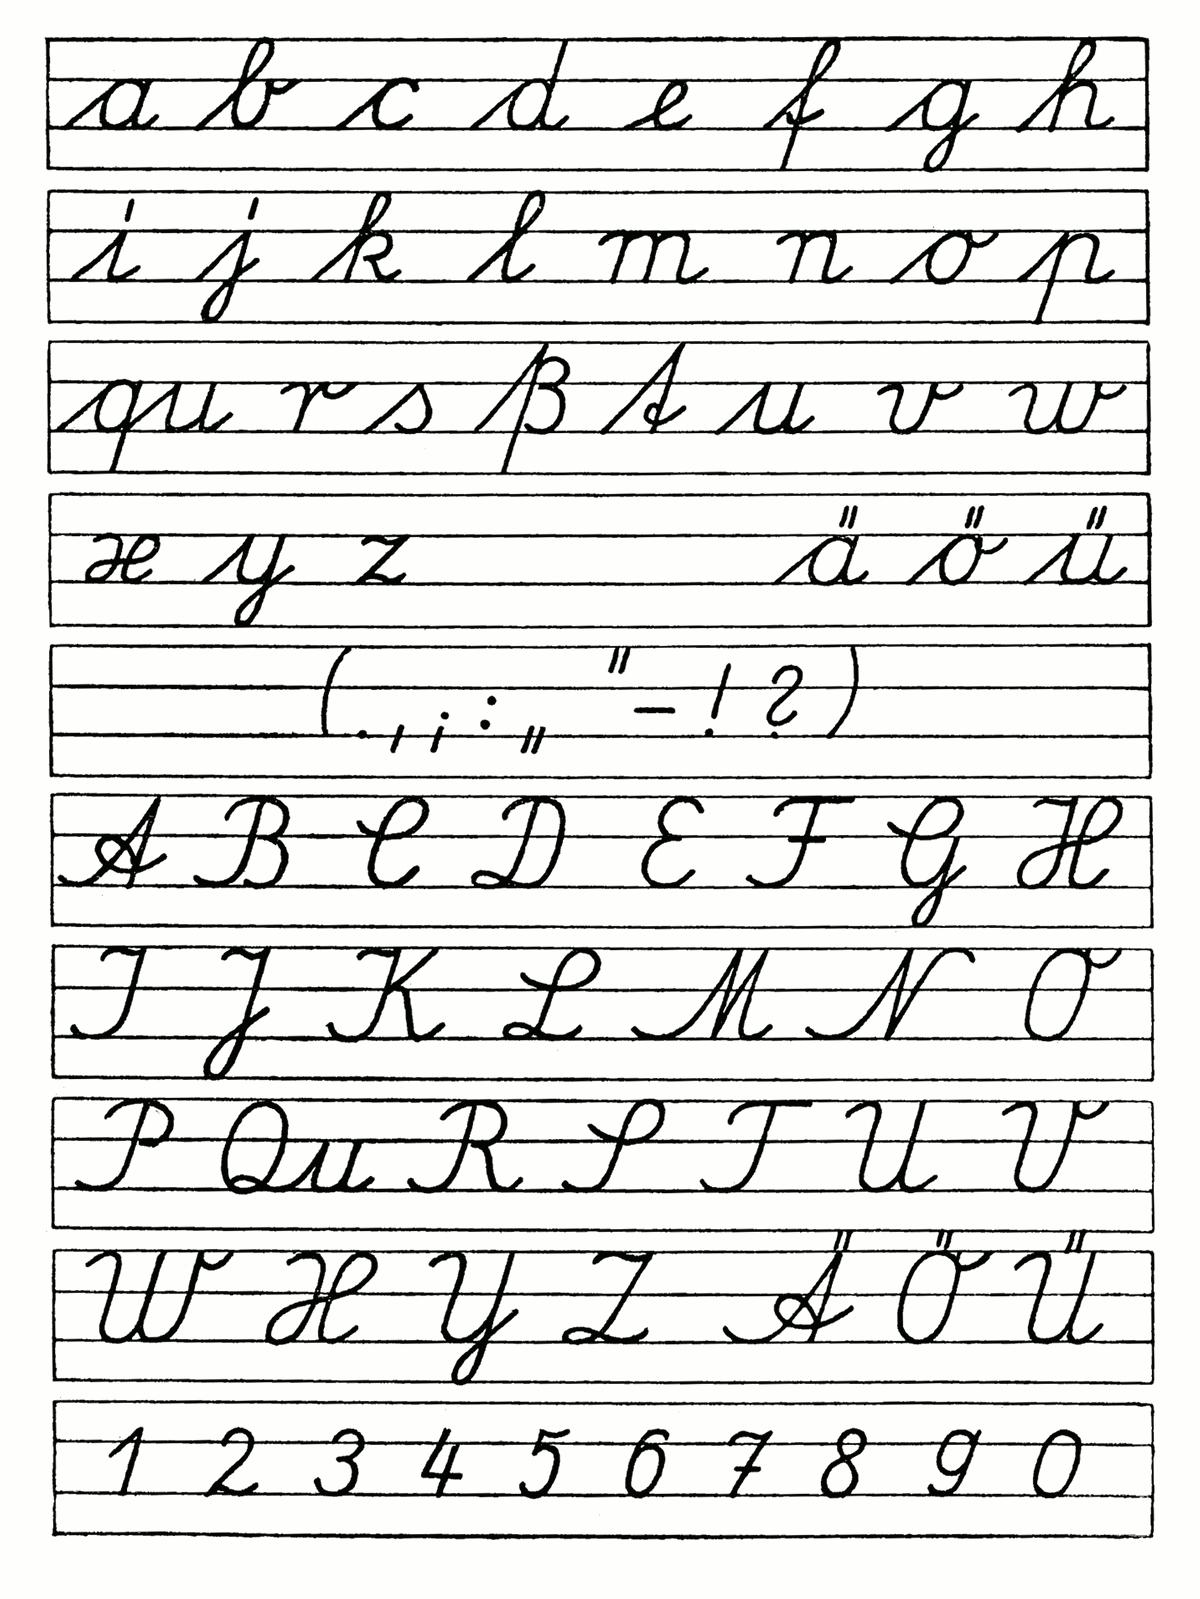 Worksheets : Cursive Handwriting Lesson Lessons Tes Teach with Alphabet Handwriting Worksheets Tes